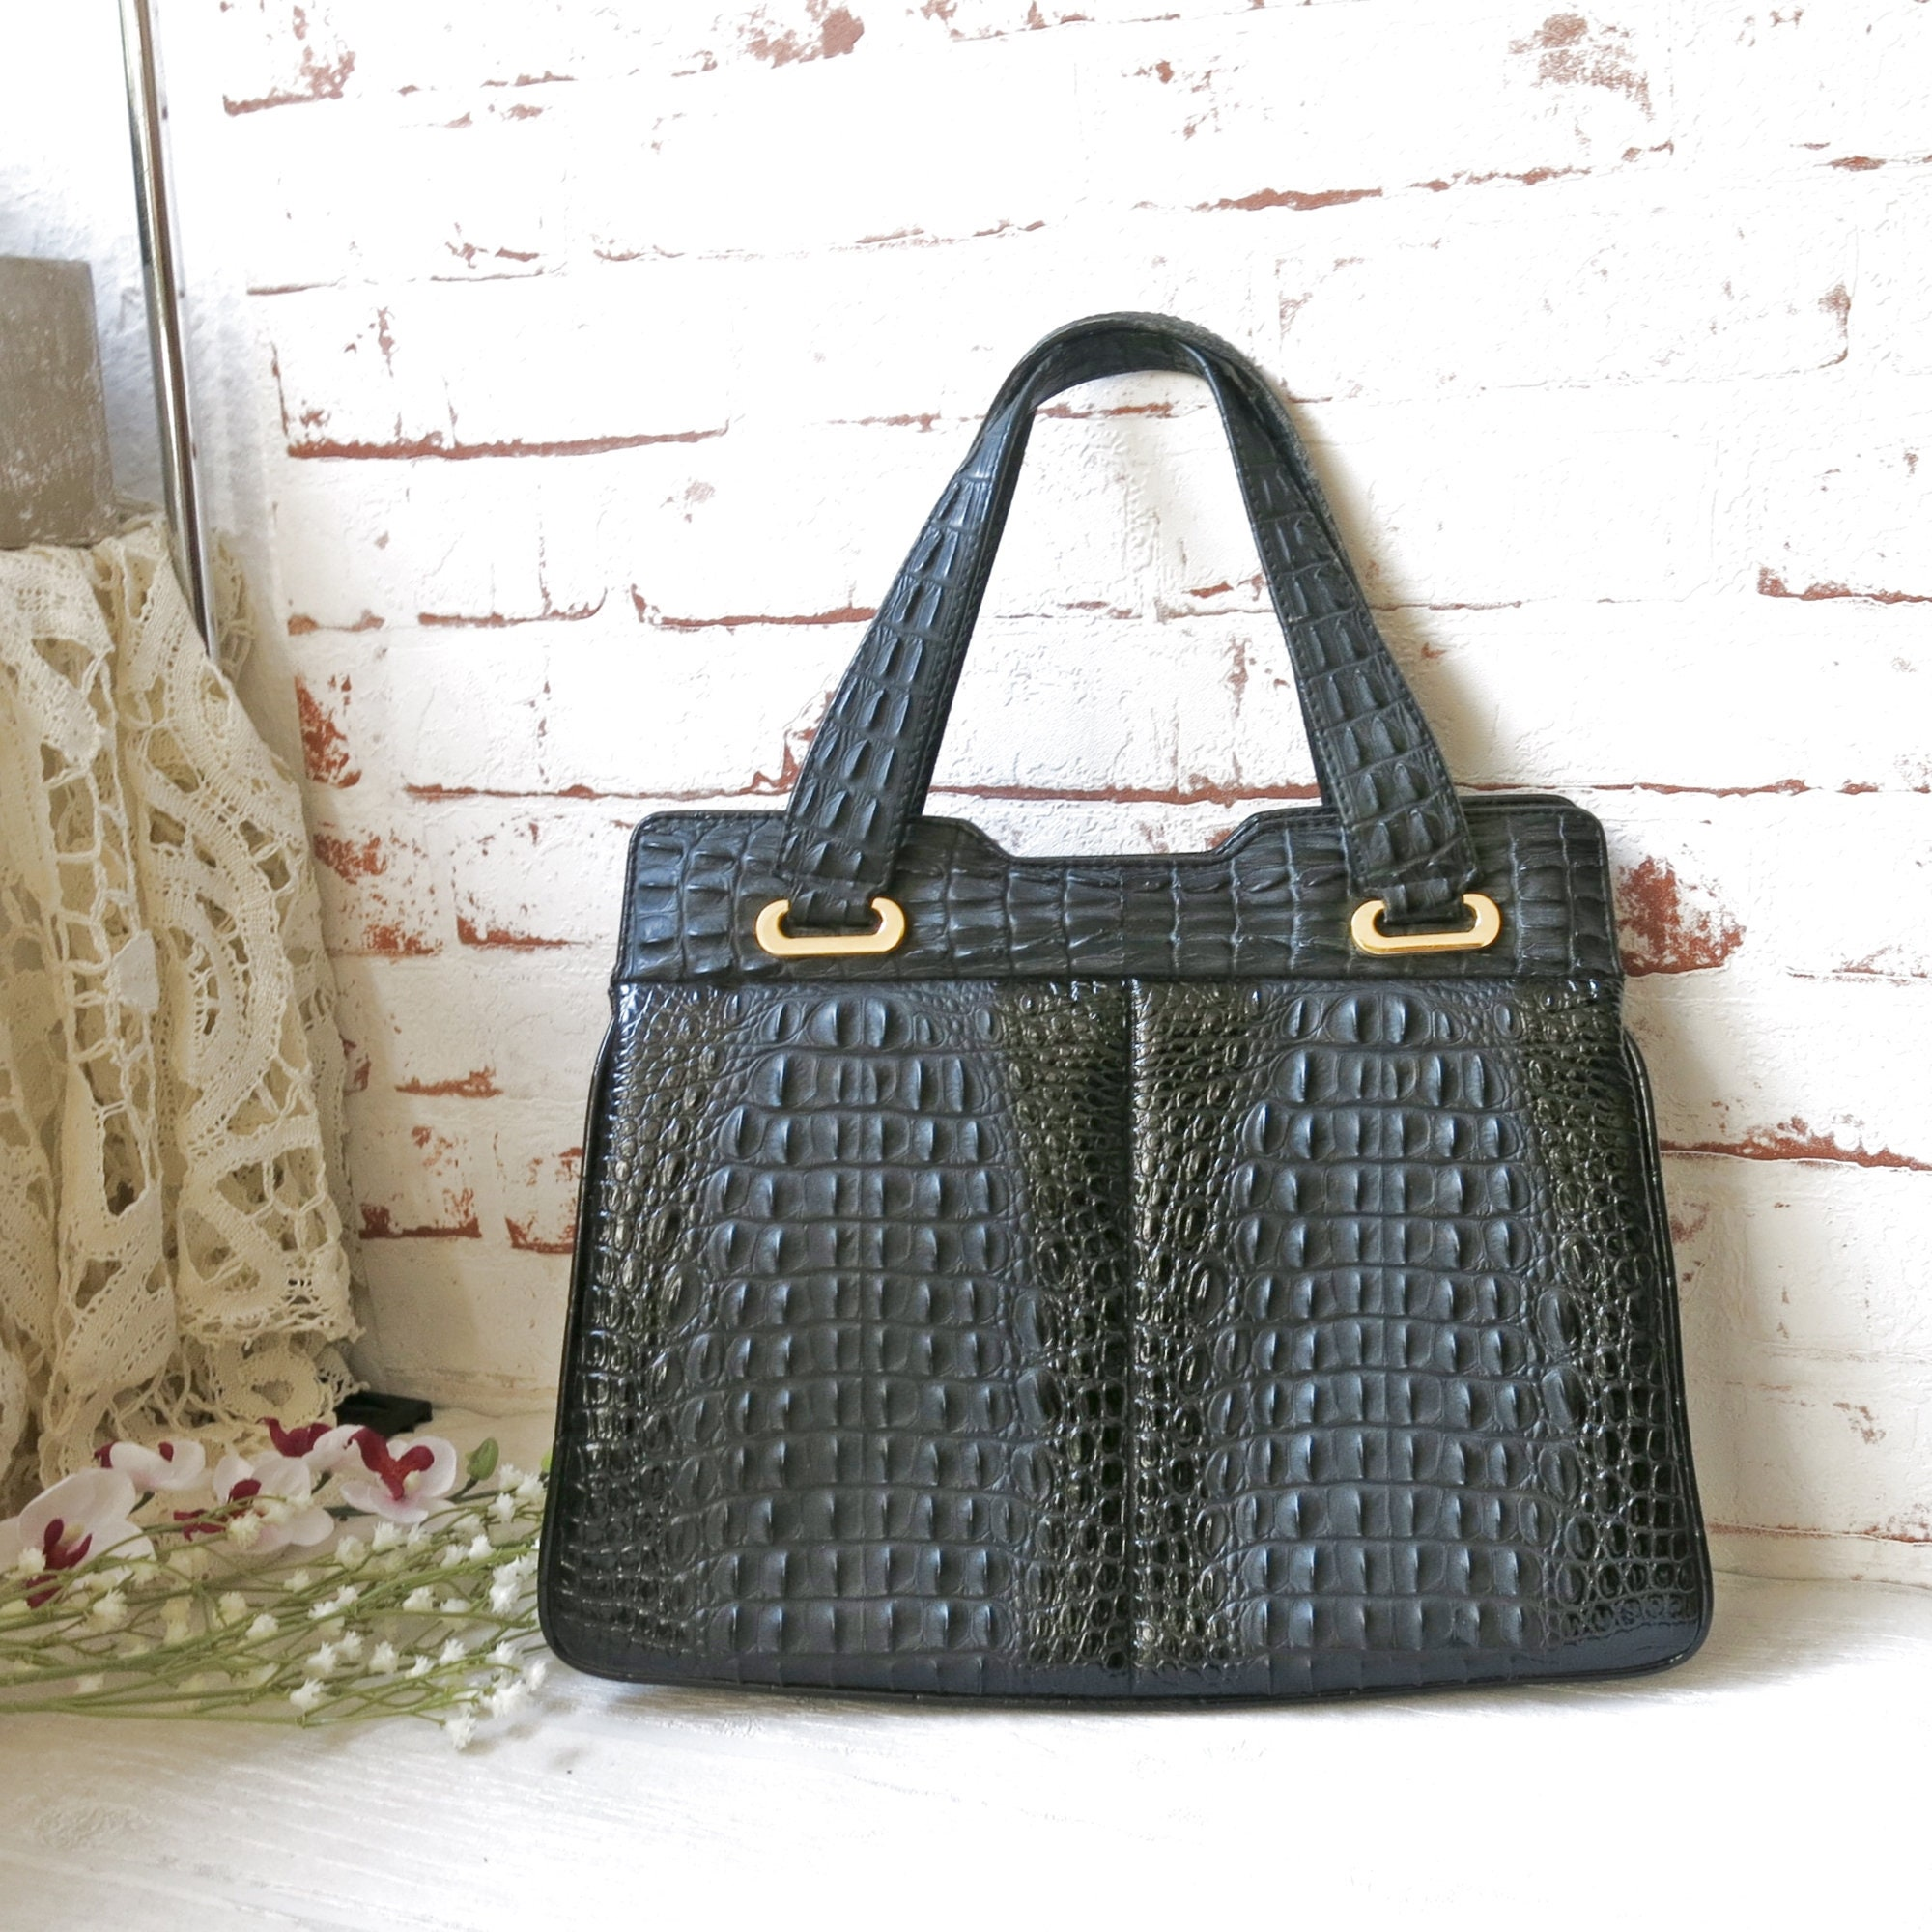 best loved 89cdc 148dd Vintage Rieke handbag, imitation leather croc look